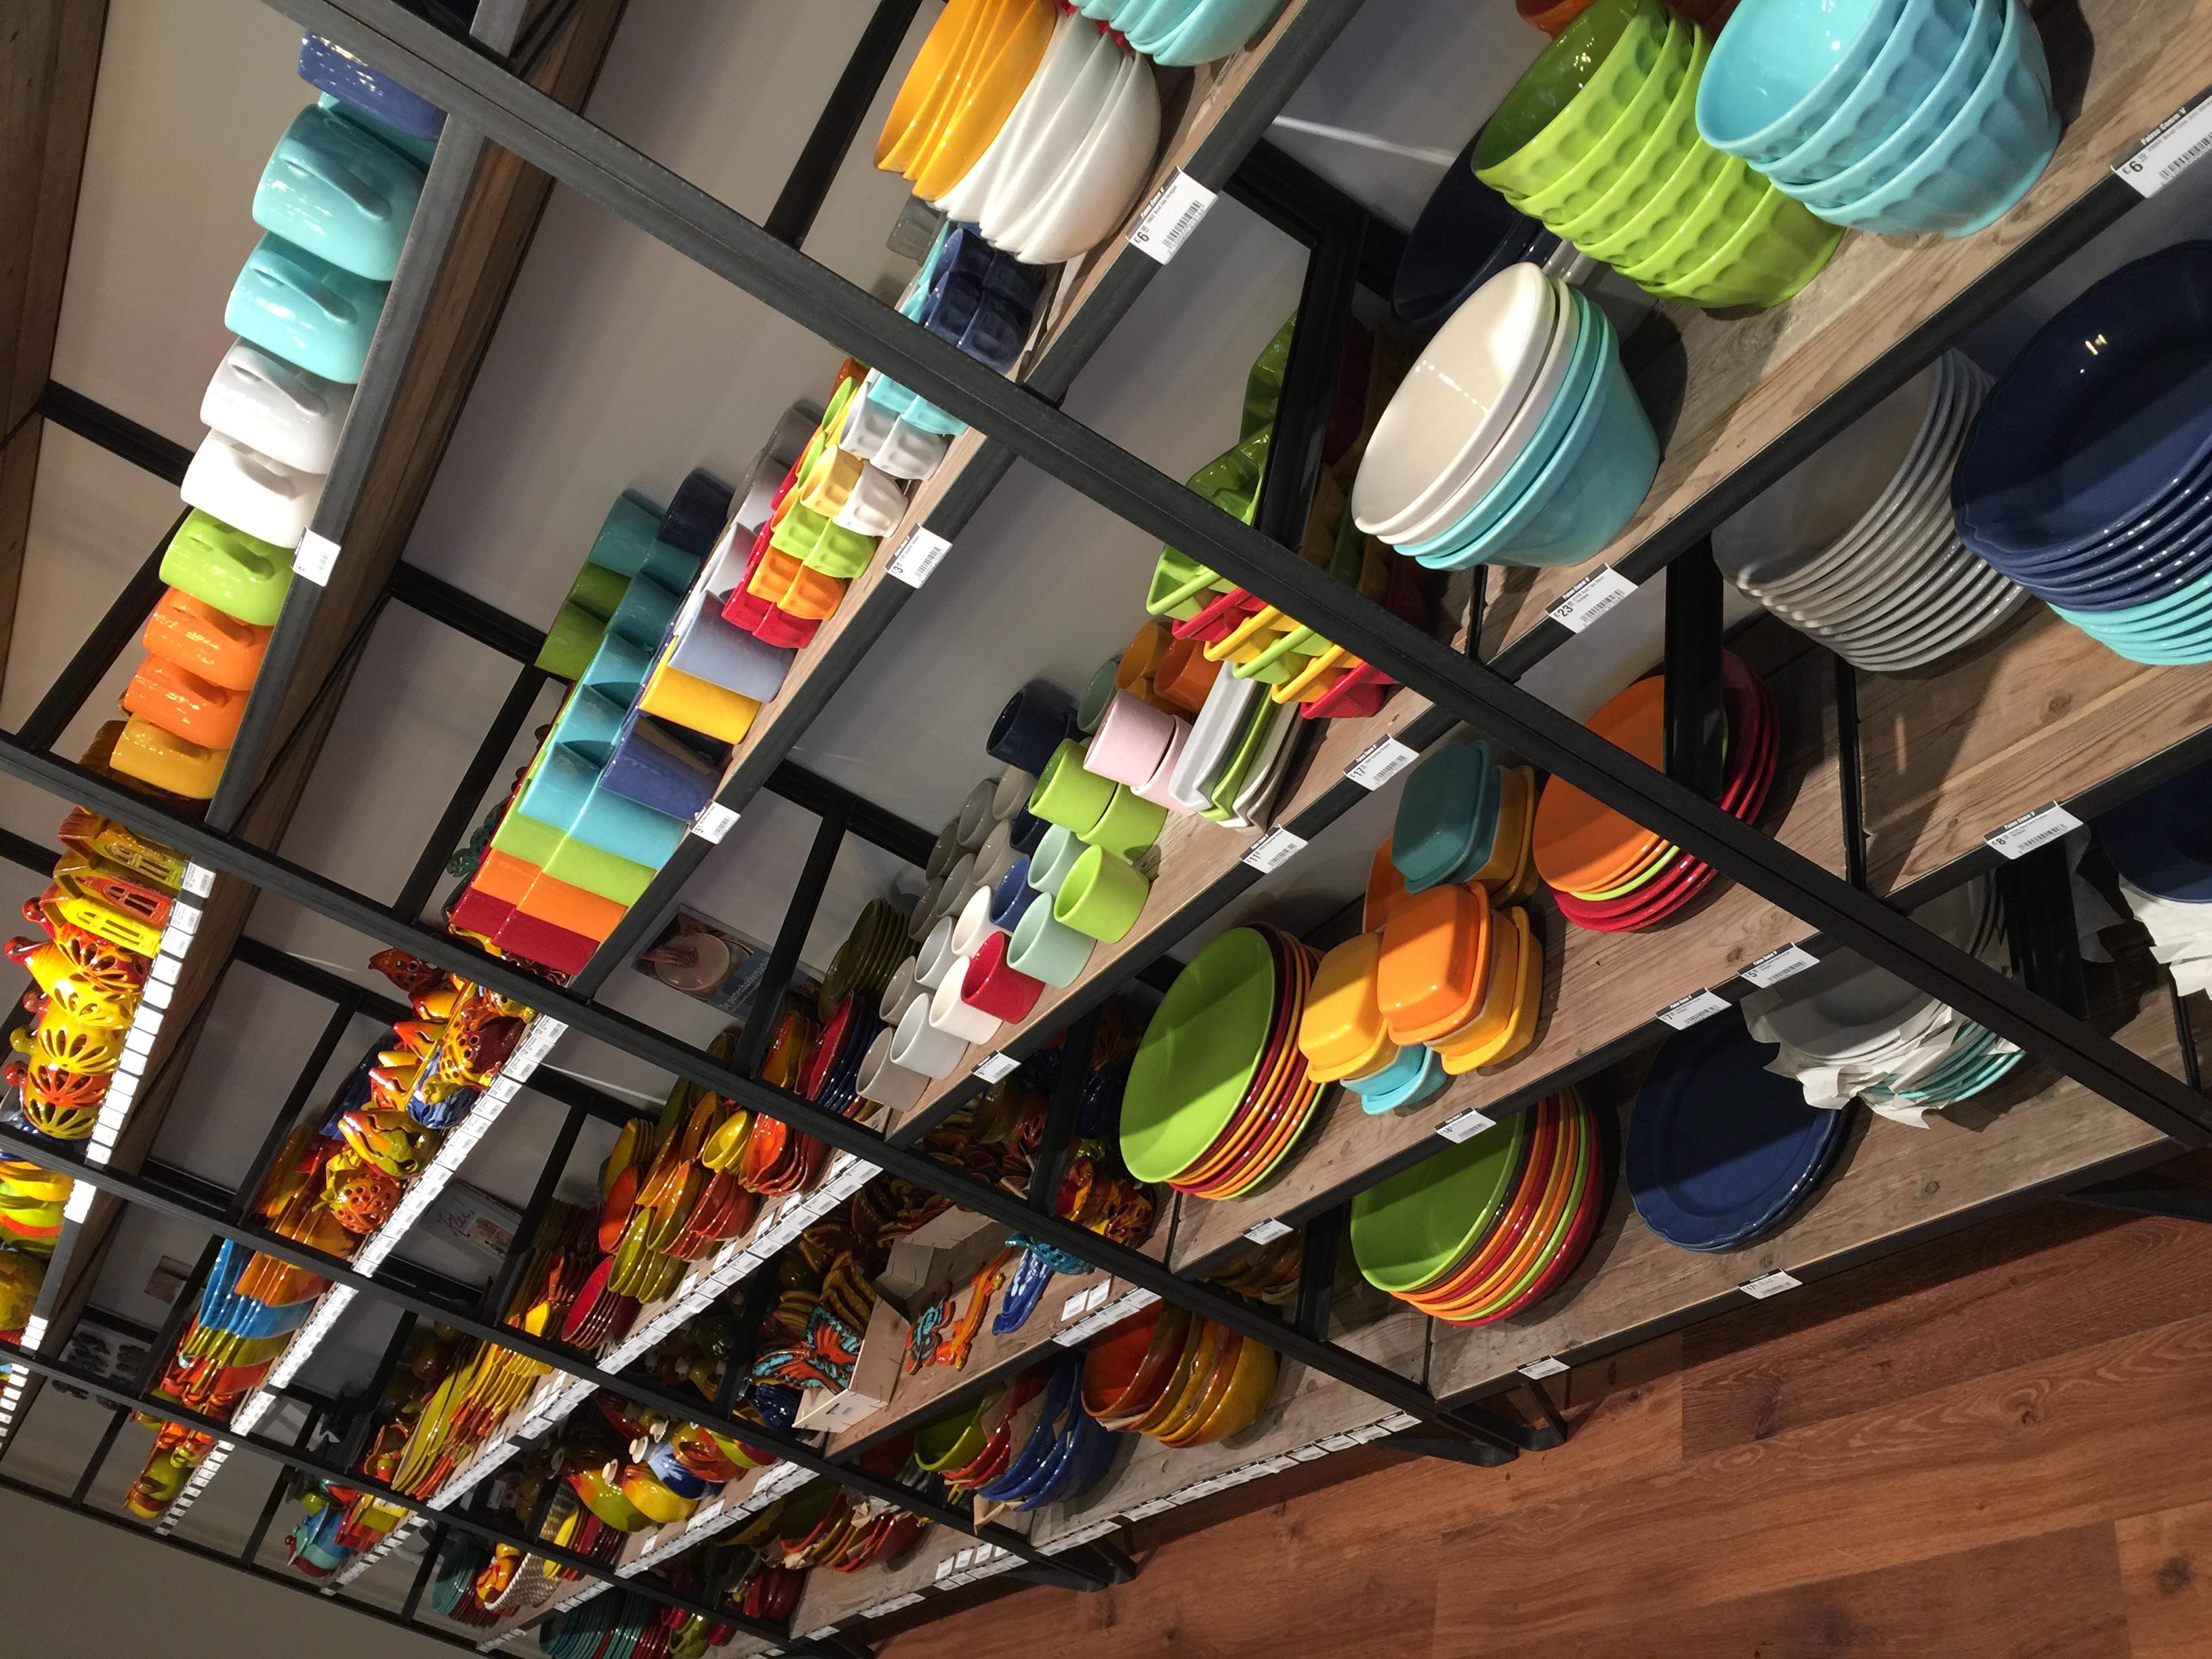 Serviesgoed en keukengerei